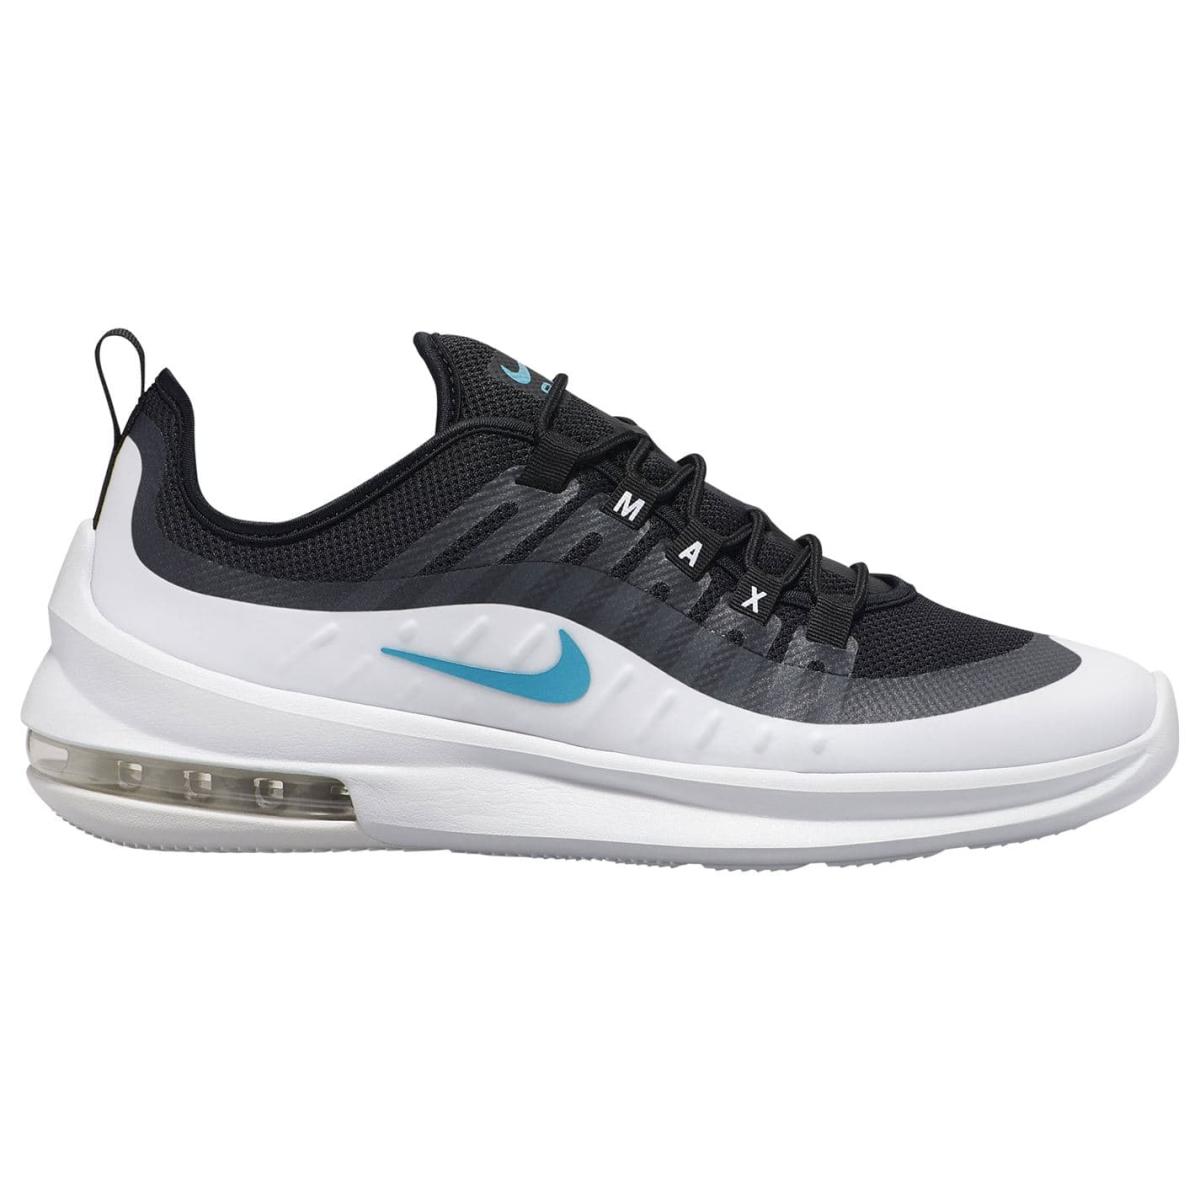 Nike Herren Sneaker Air Max Axis Premium Fitnessschuhe